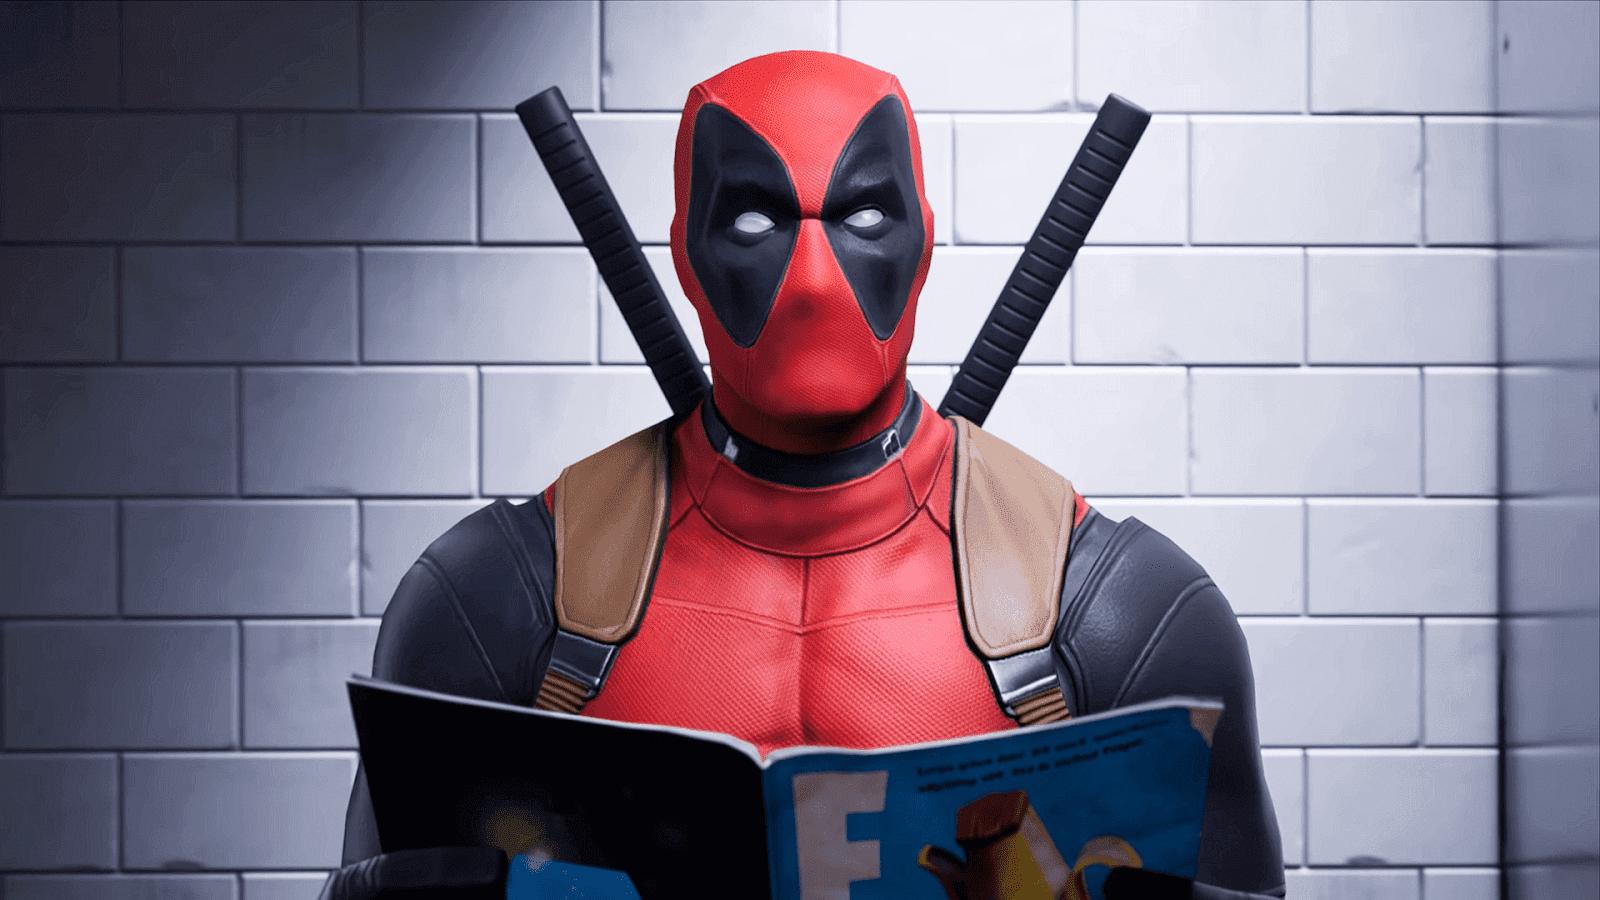 Deadpool Kini Hadir di Fortnite